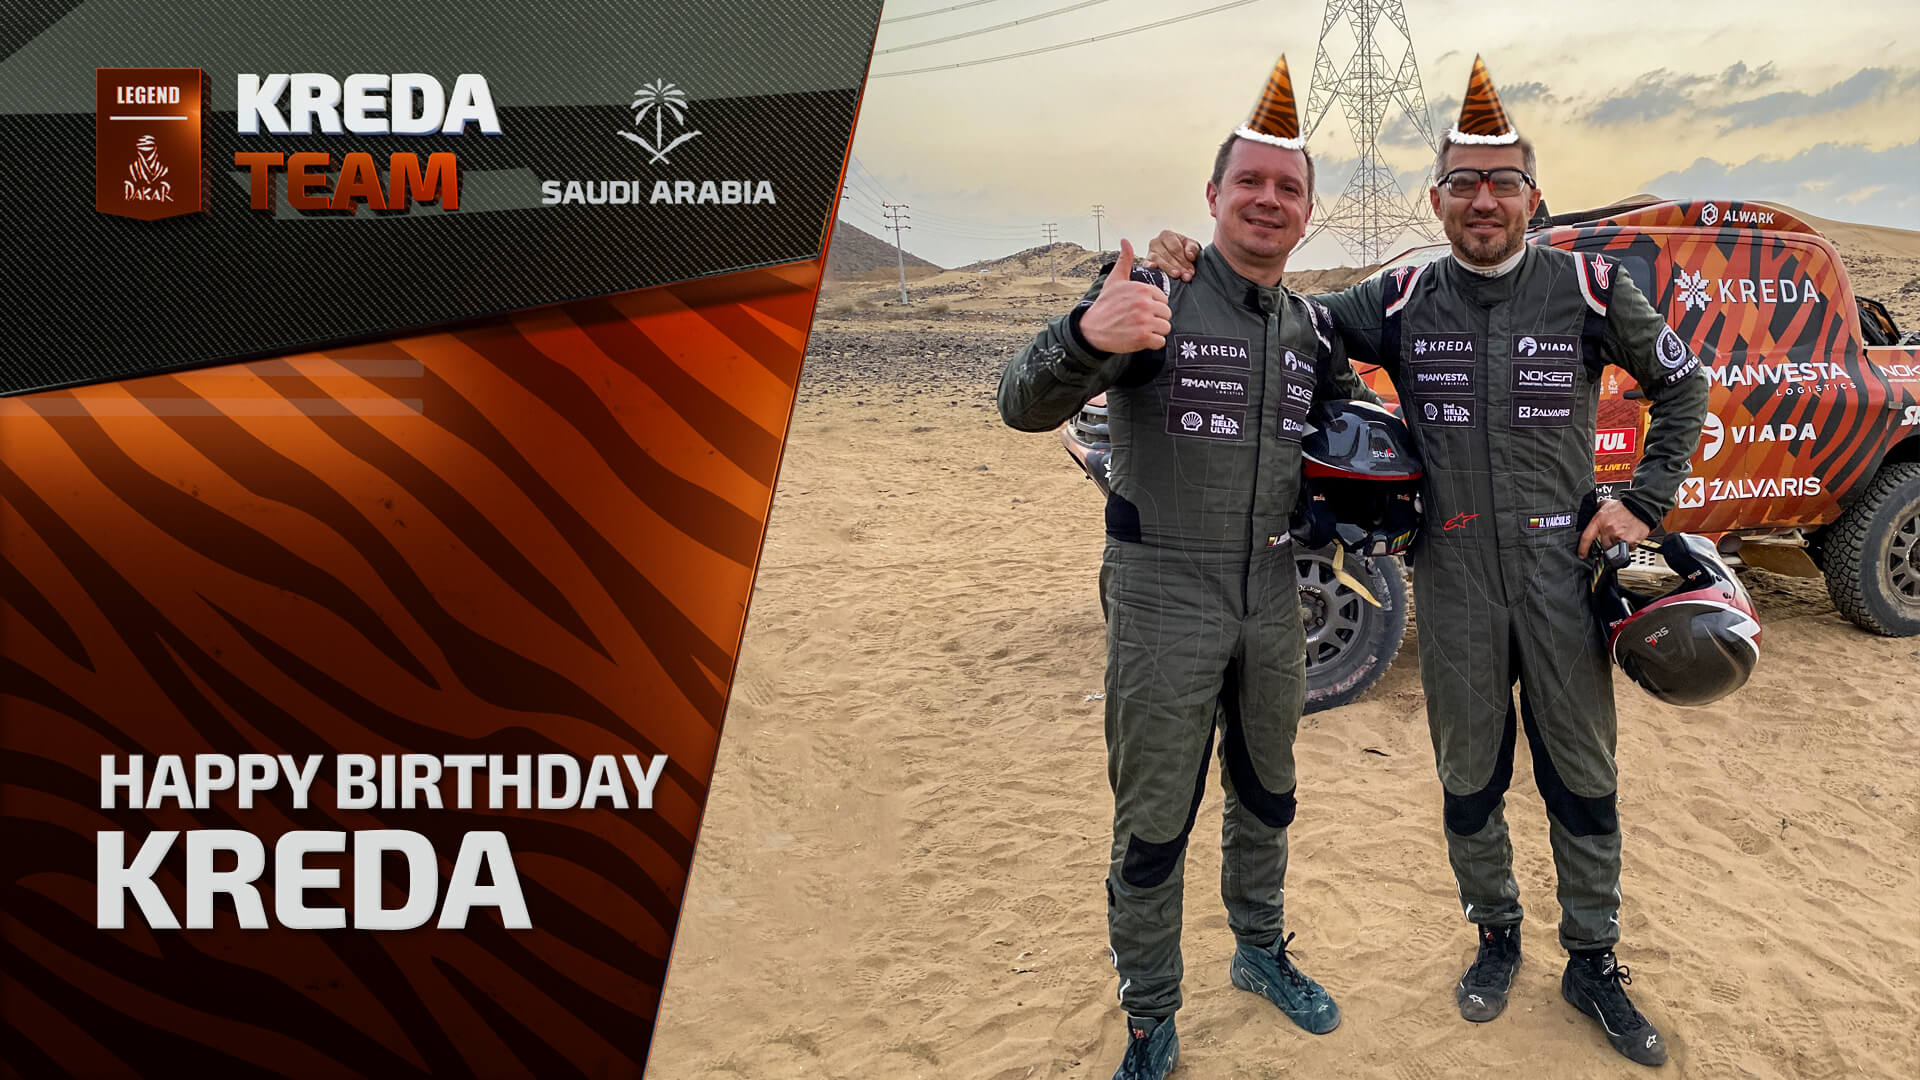 Wishing happy birthday to Kreda!